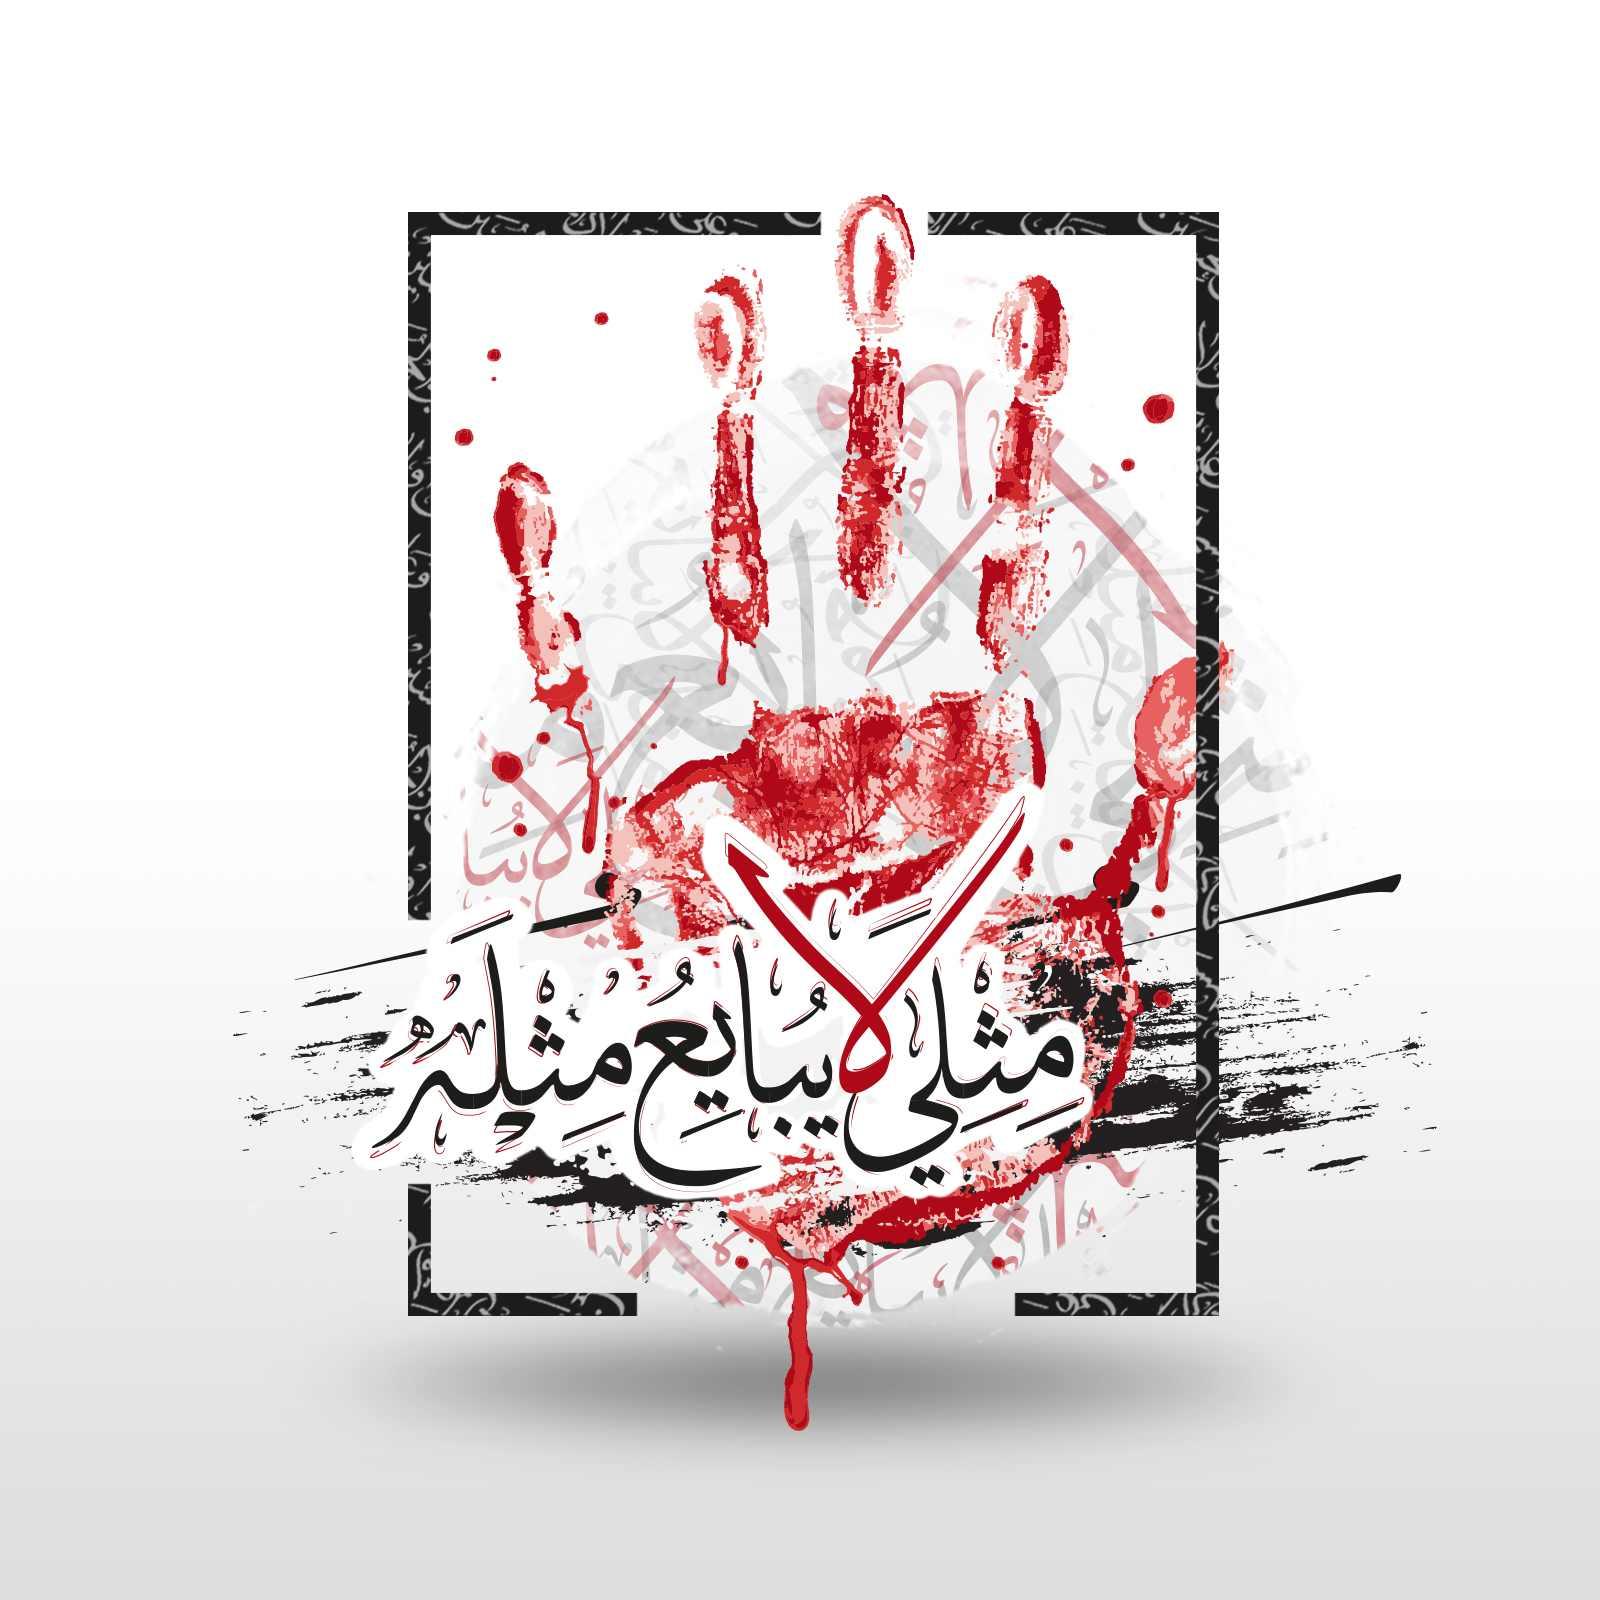 ائتلاف شباب ثورة 14 فبراير يدشّن شعار عاشوراء للعام 1440هـ